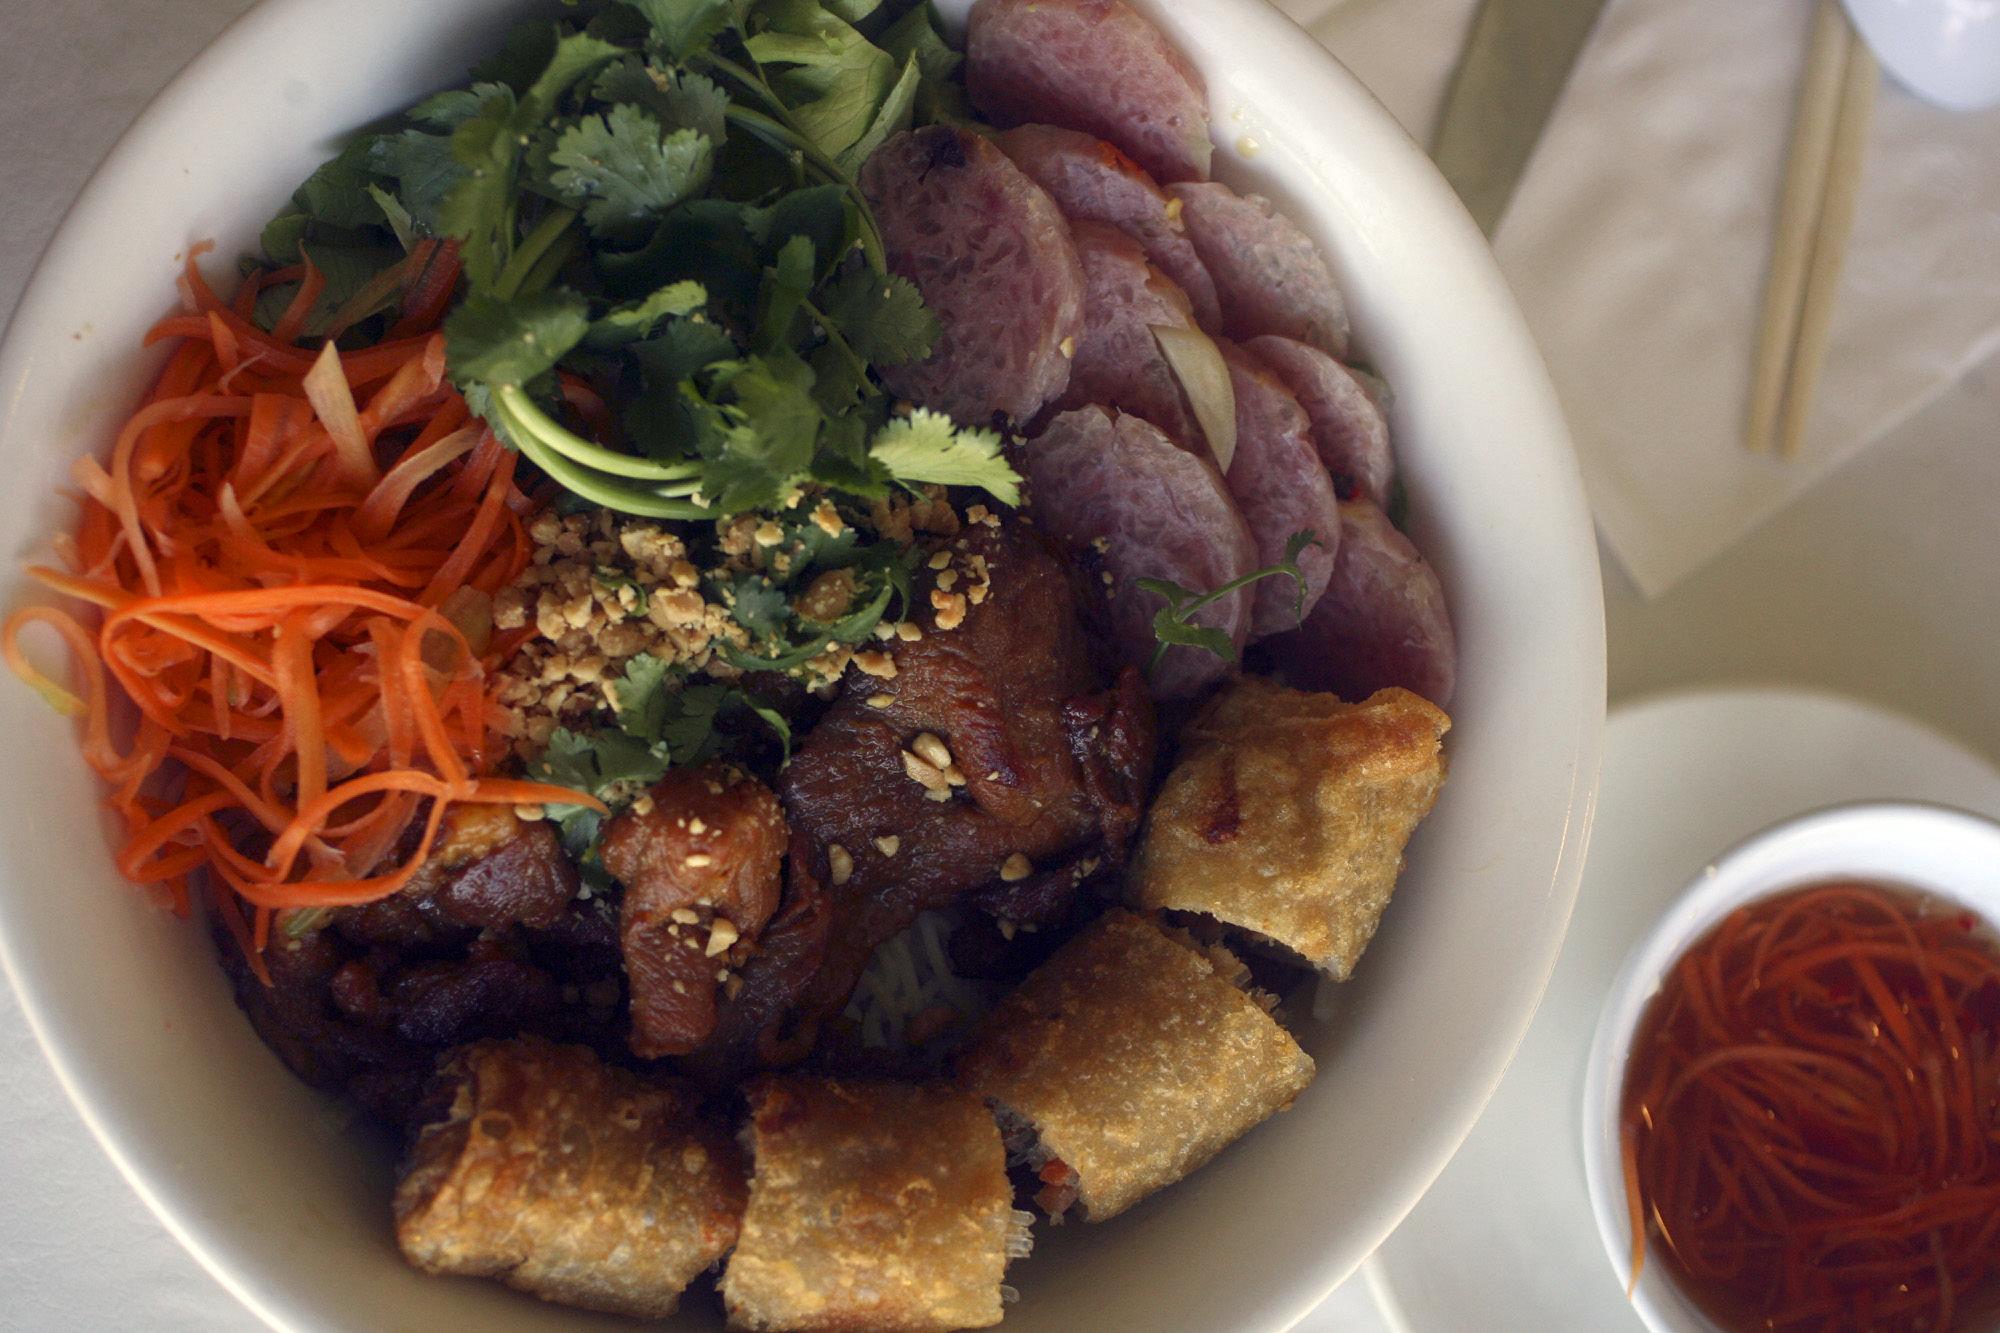 Side dish: Vietnamese